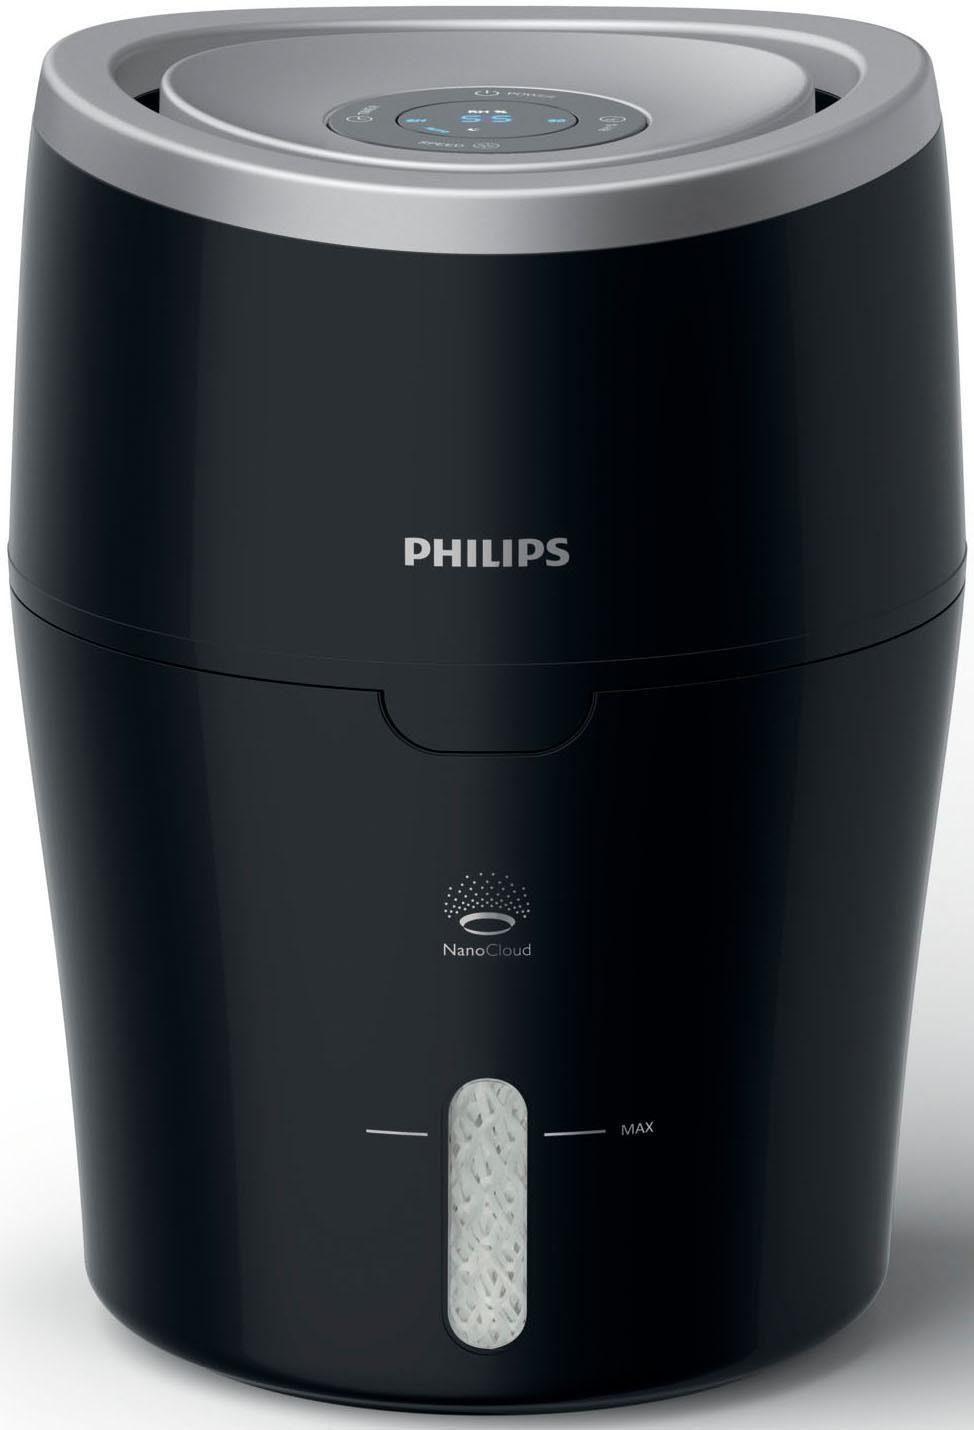 Philips Luftbefeuchter HU4813/10 2000 Series, mit NanoCloud-Technologie